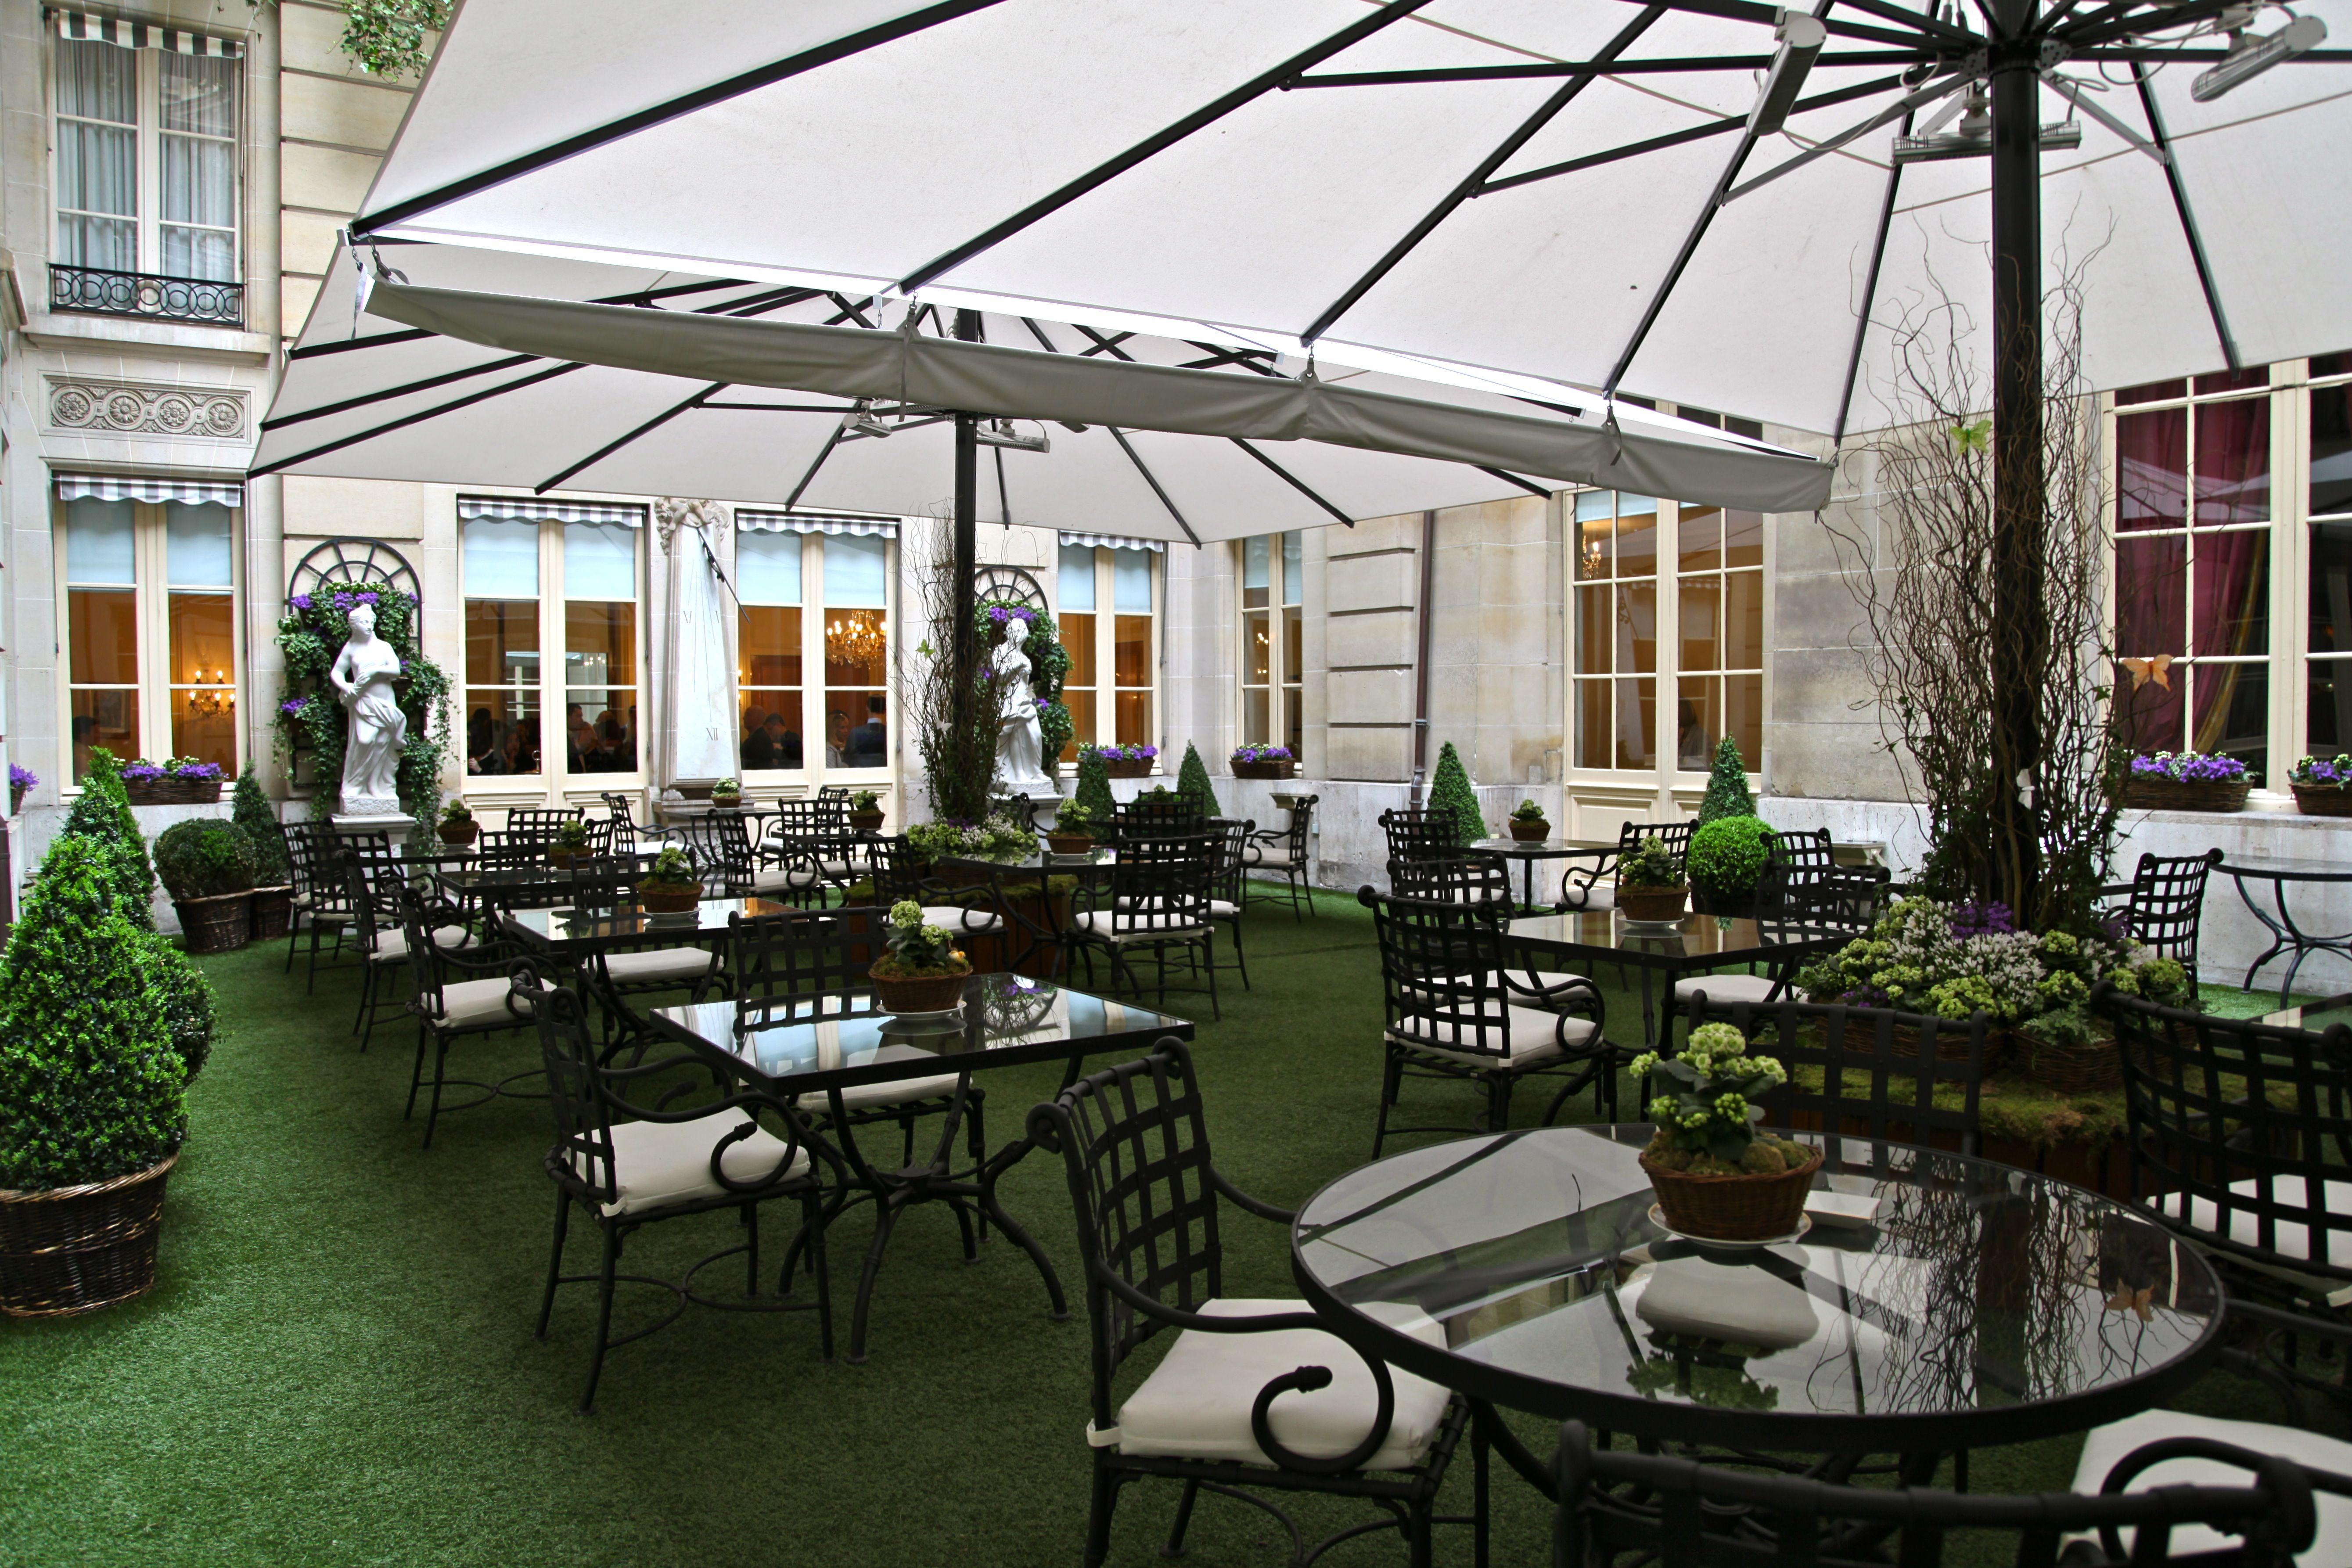 Jardin hotel de crillon paris outdoor furniture for Hotel des jardins paris